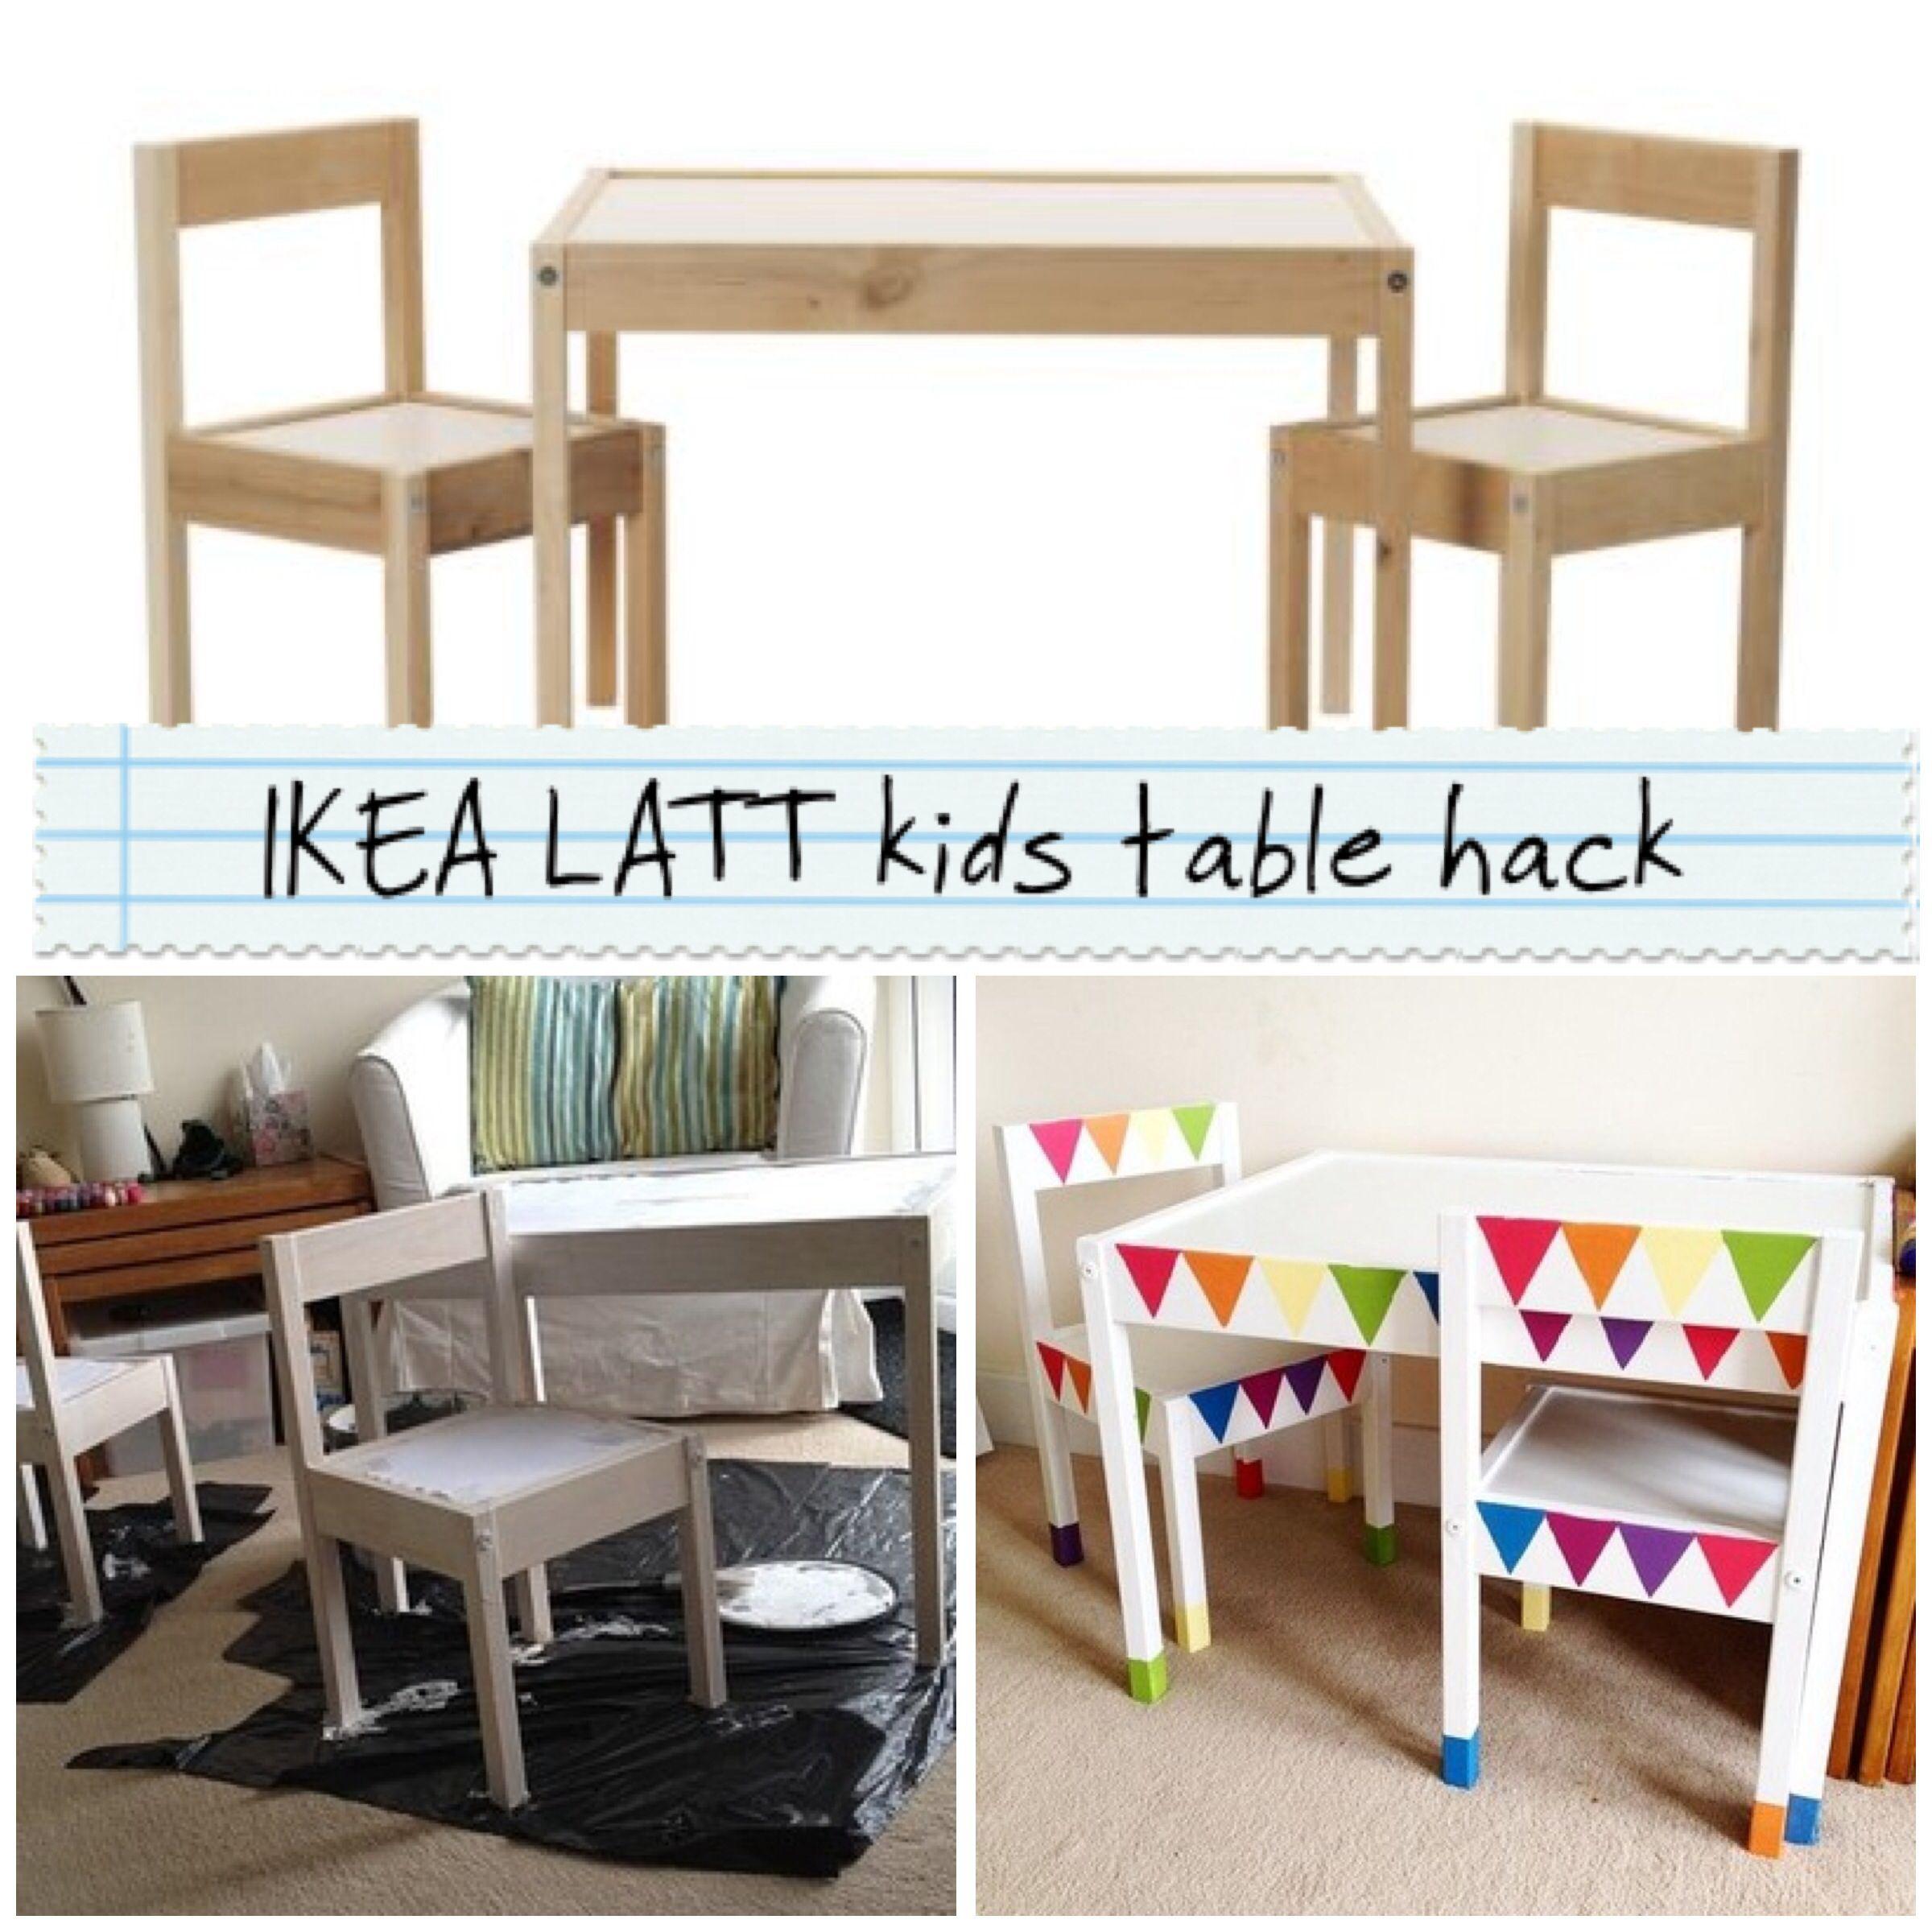 Kids Bedroom Bunting ikea latt kids table hack - rainbow bunting   play   pinterest